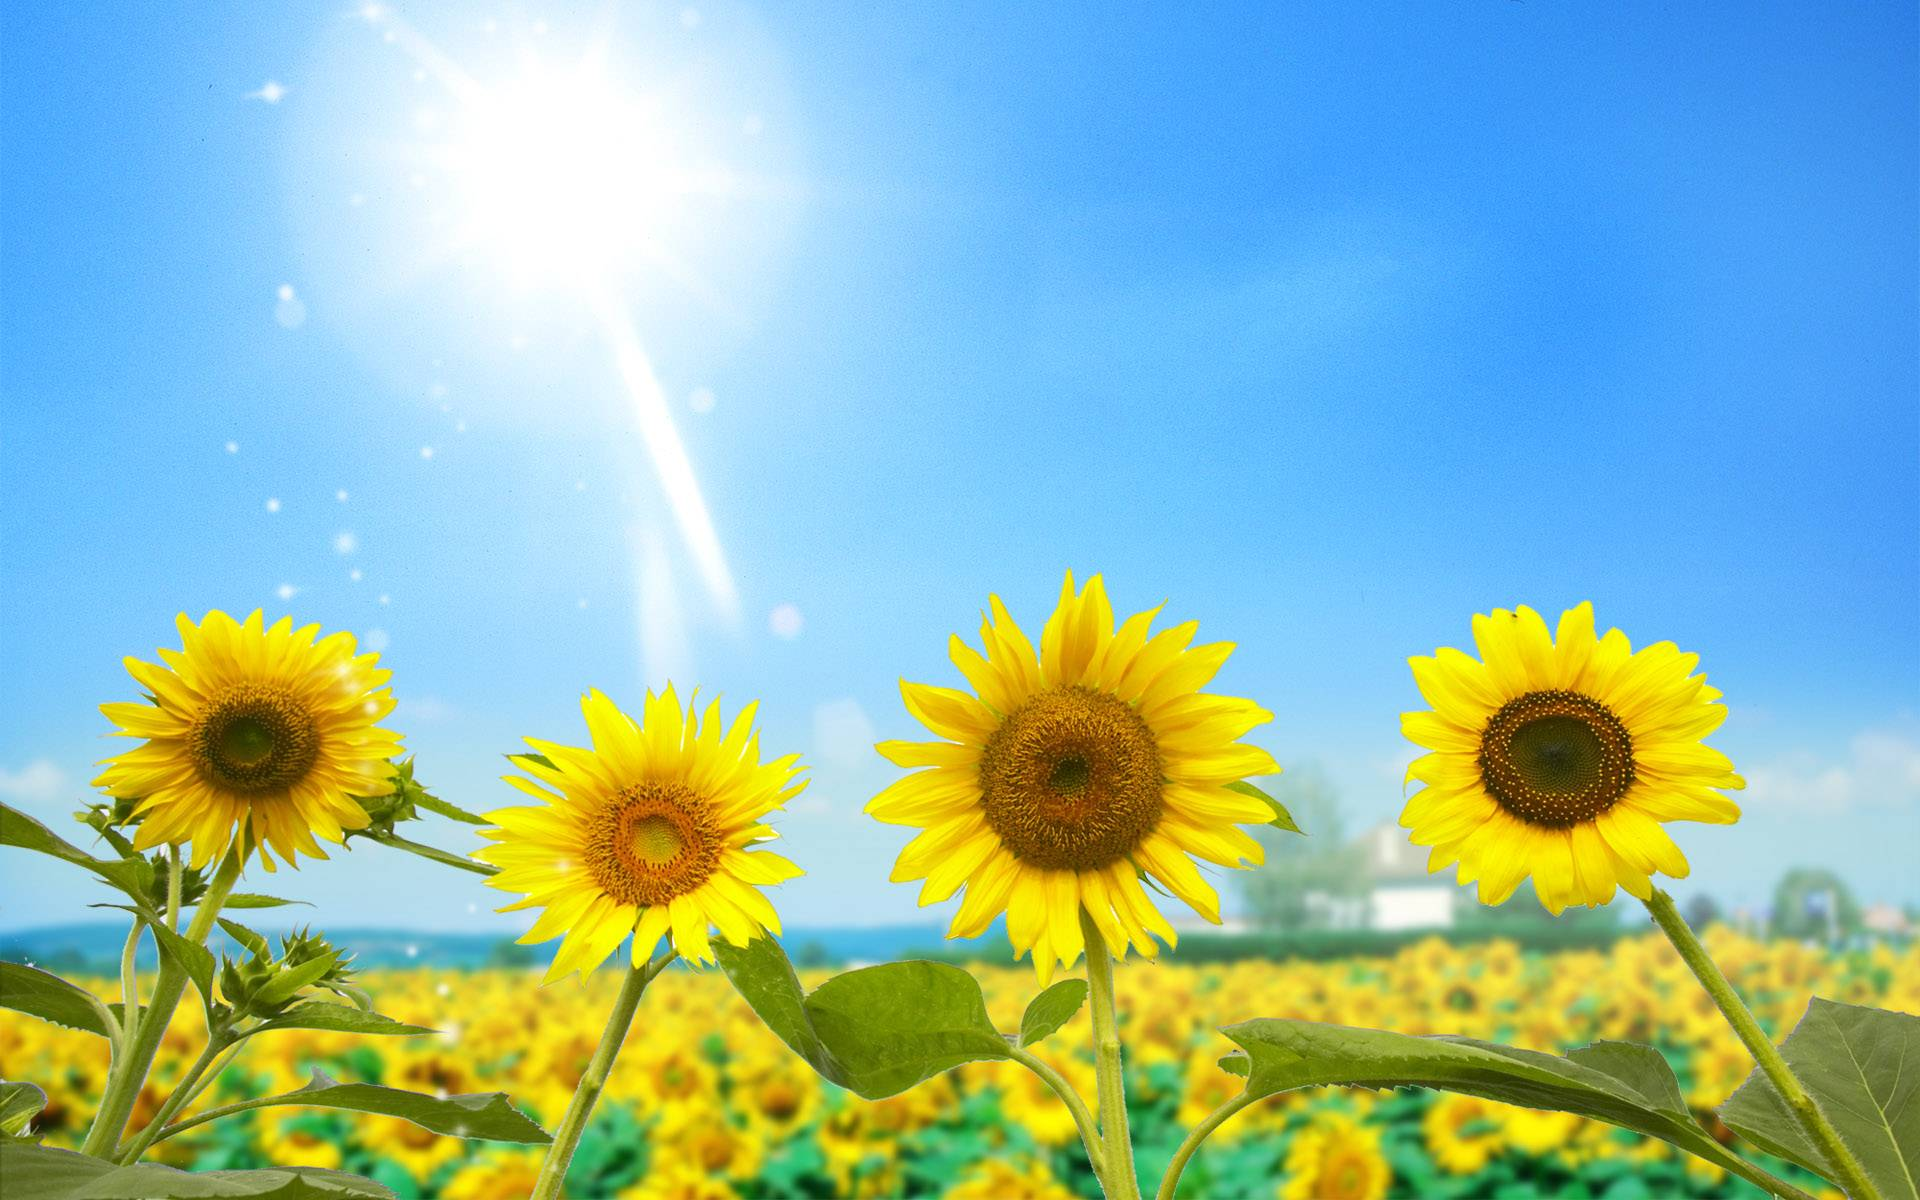 172746 gorgeous flower under sunlight wallpaper hd one light community 1920 1200 in 172746 gorgeous flower under sunlight wallpaper hd voltagebd Gallery